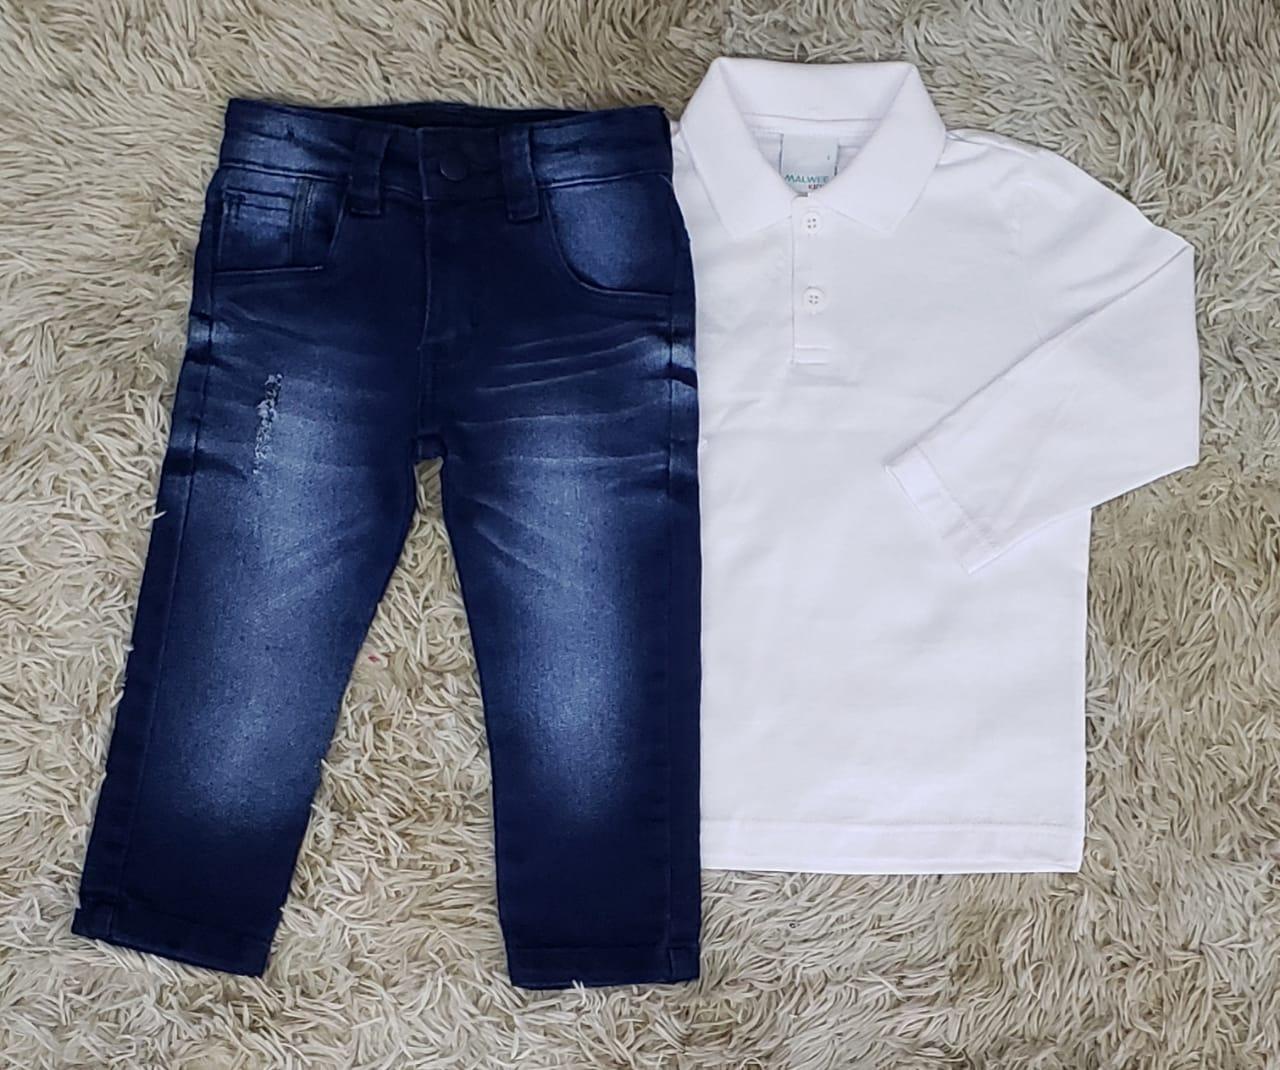 Calça Jeans com Polo Manga Longa Branca